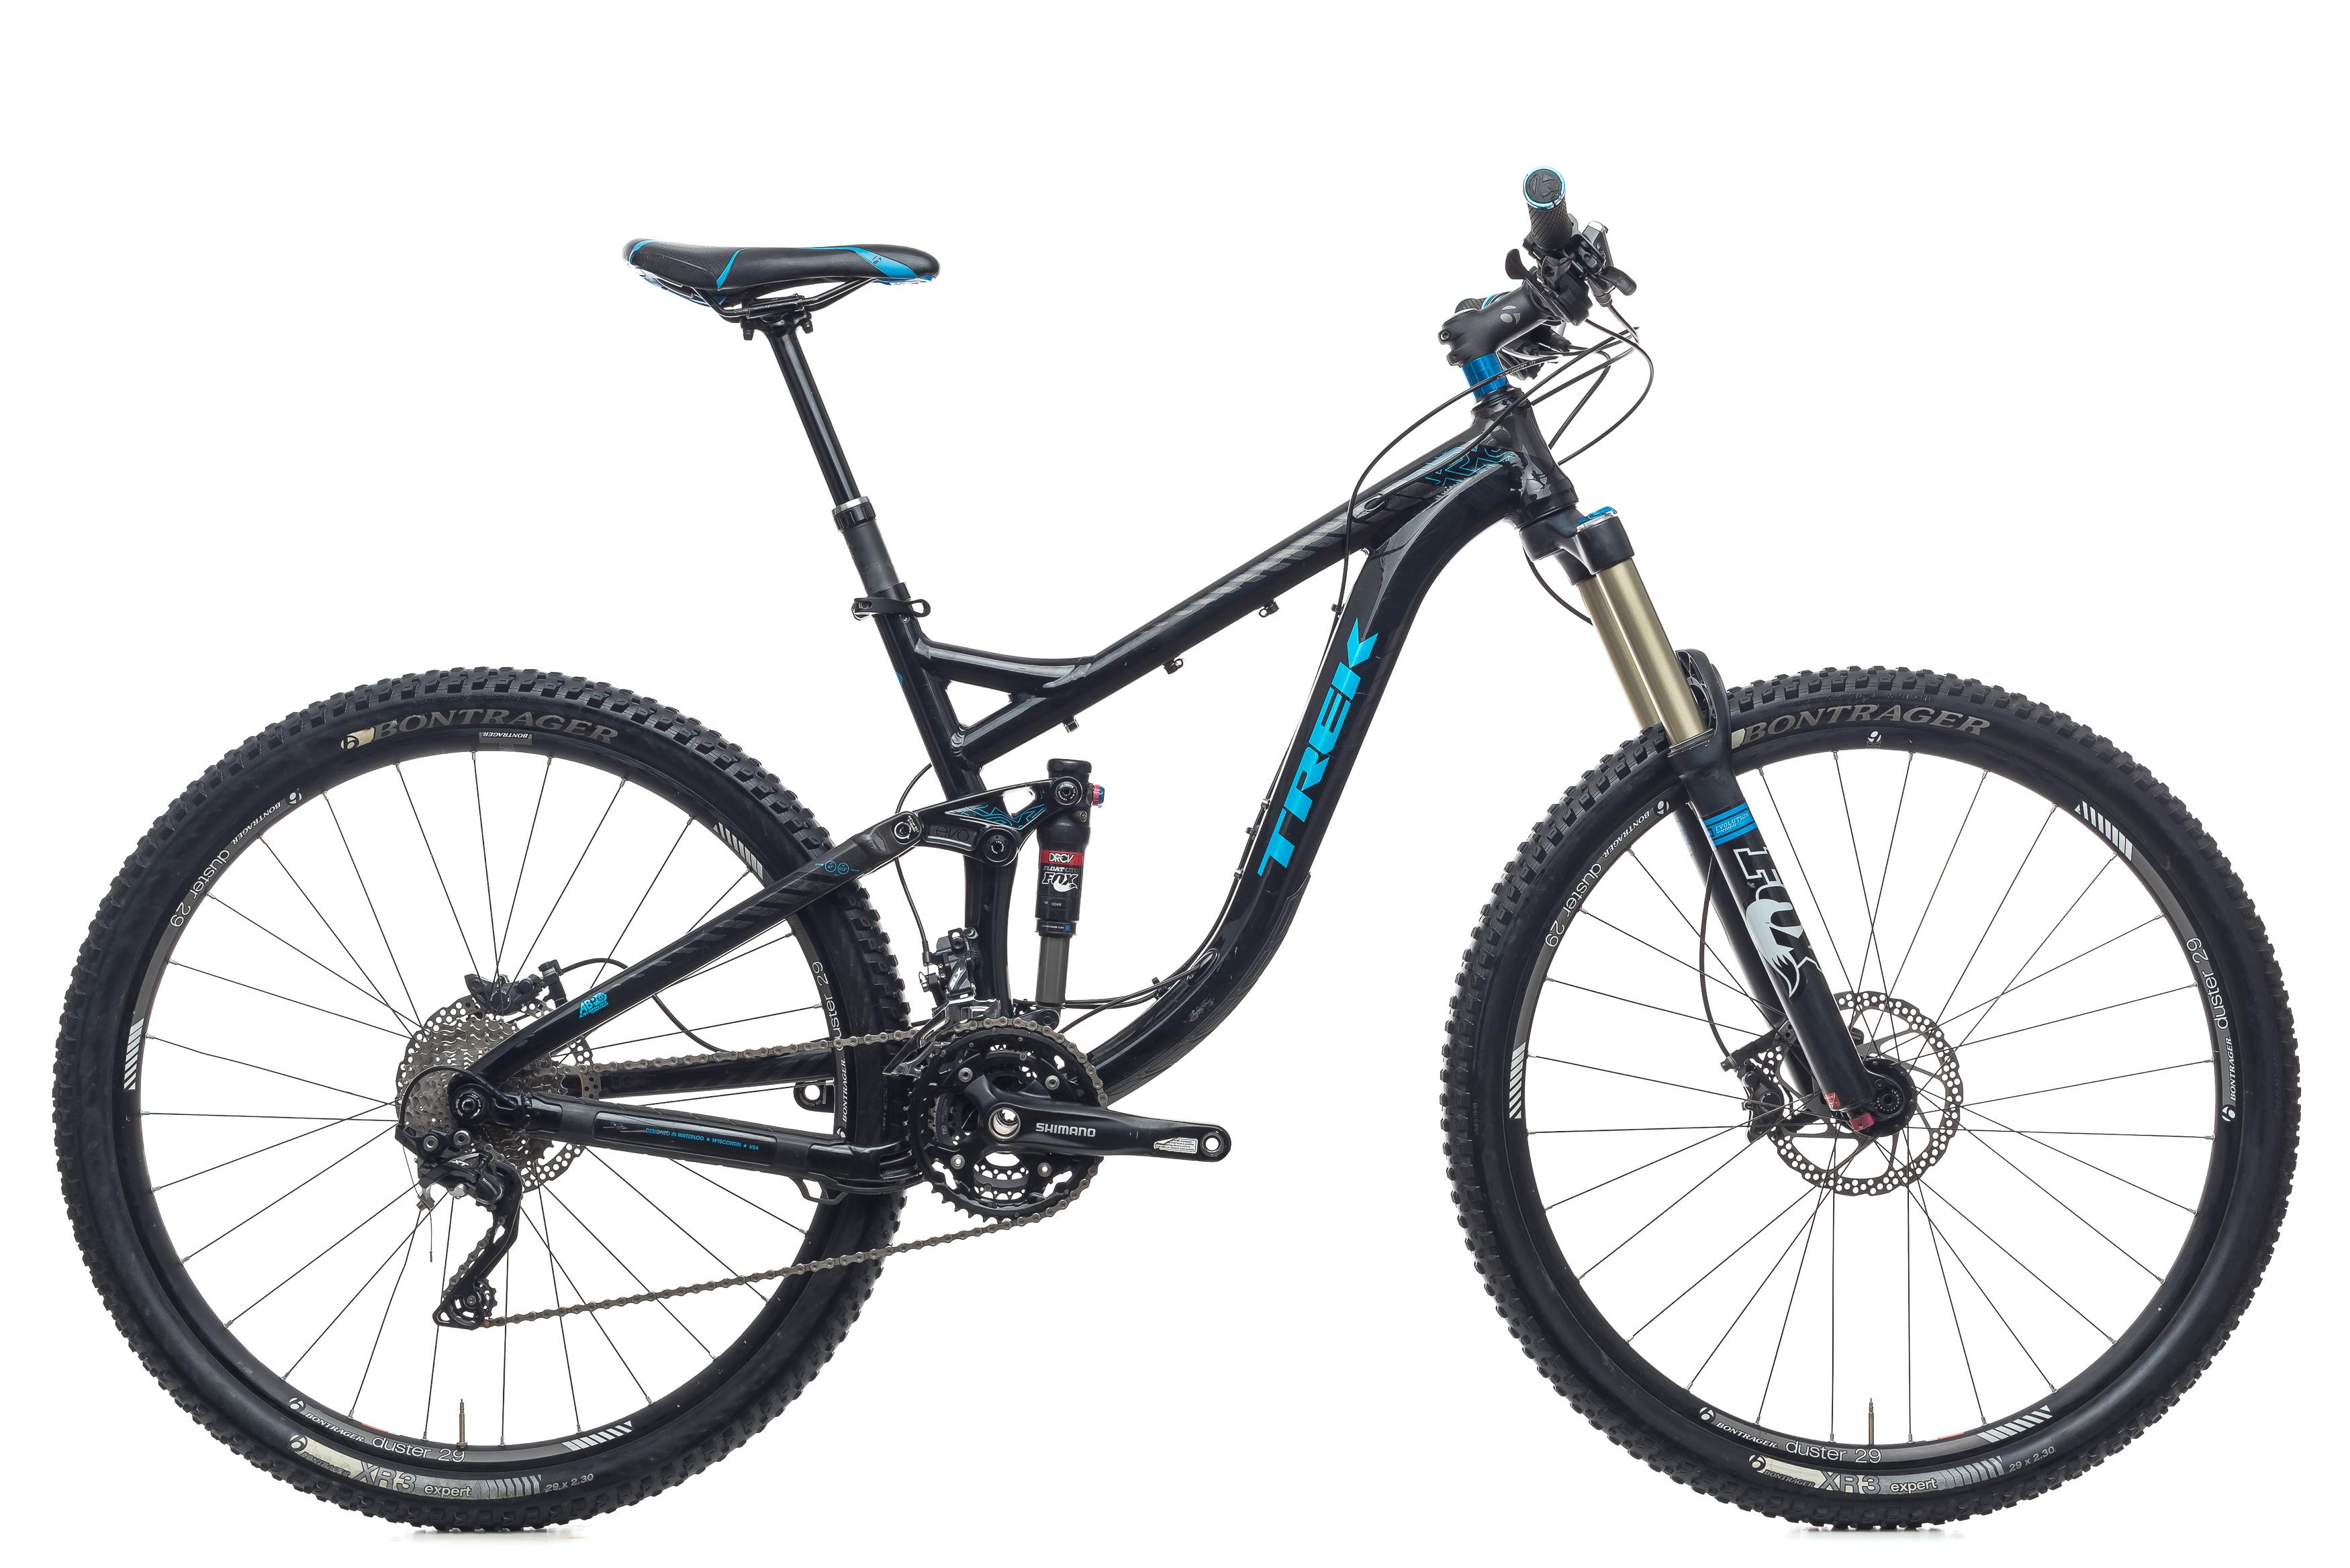 a16e10f4fab 2014 Trek Remedy 8 Mountain Bike 19in 29